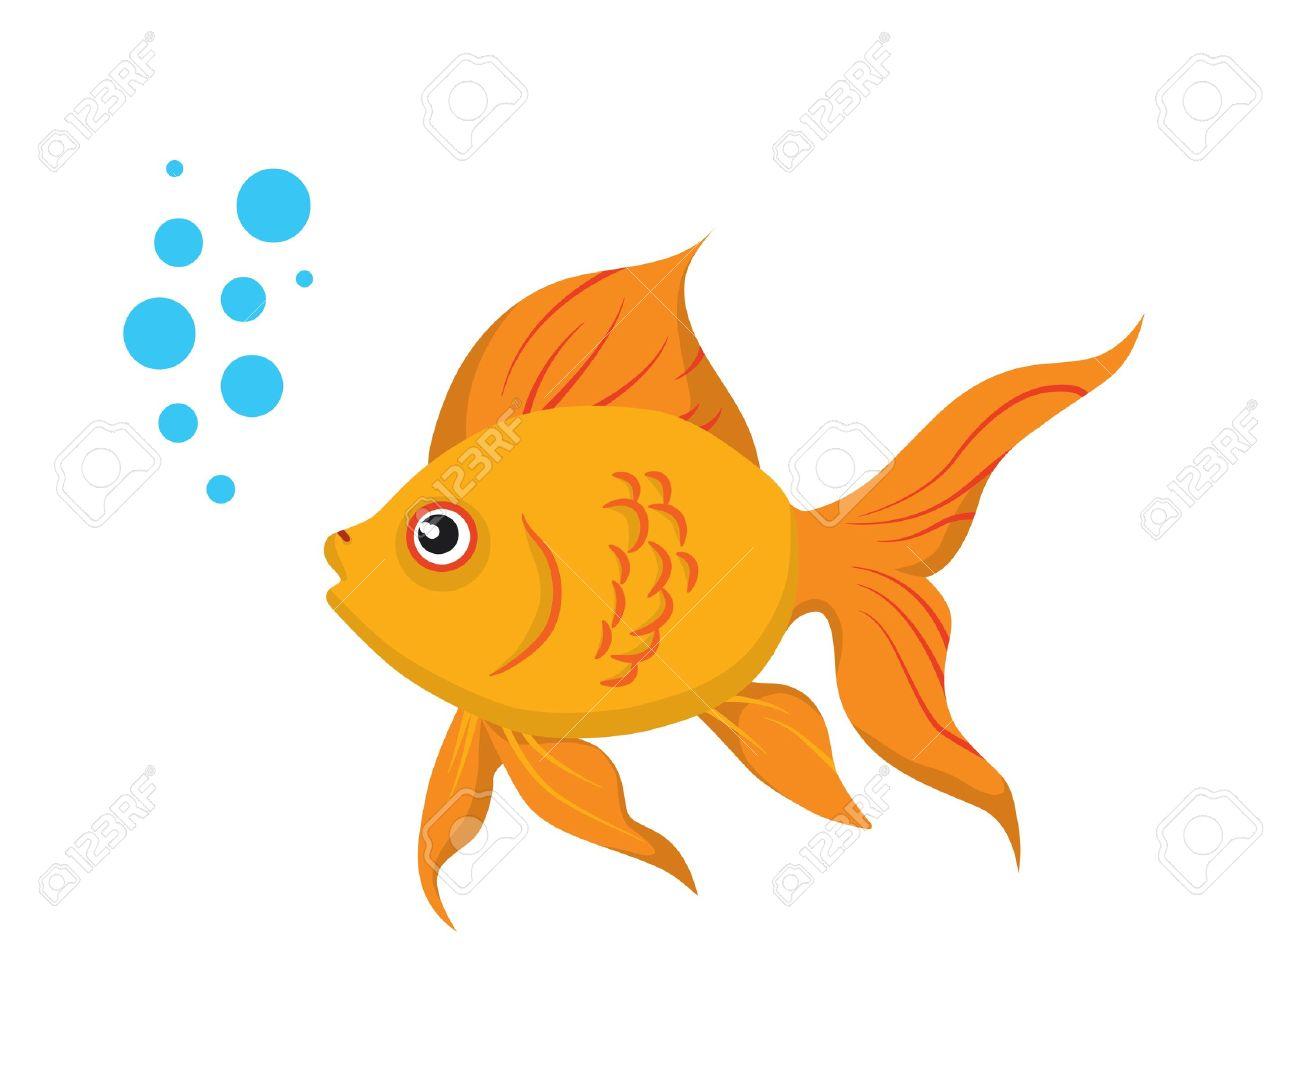 Goldfish clipart. Image of clip art